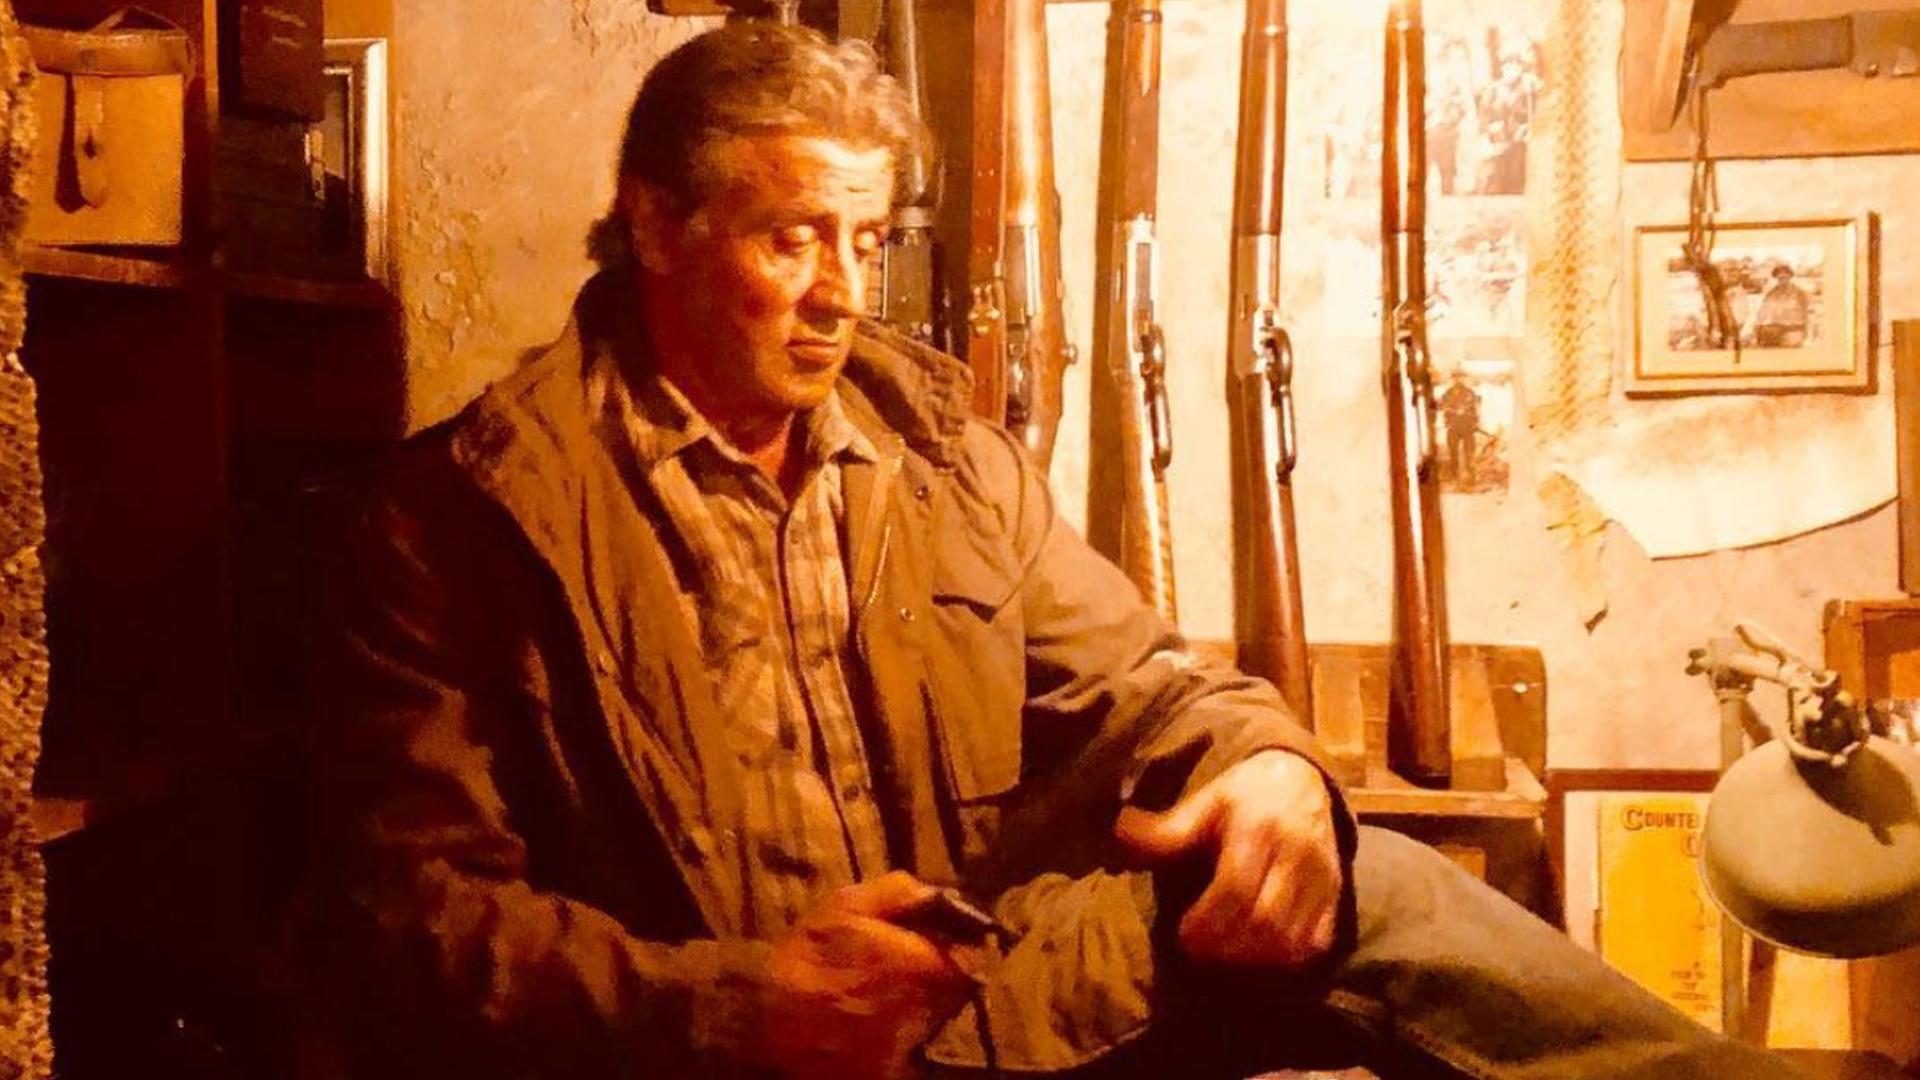 Sylvester Stallone Rambo 5 Wallpapers - Wallpaper Cave